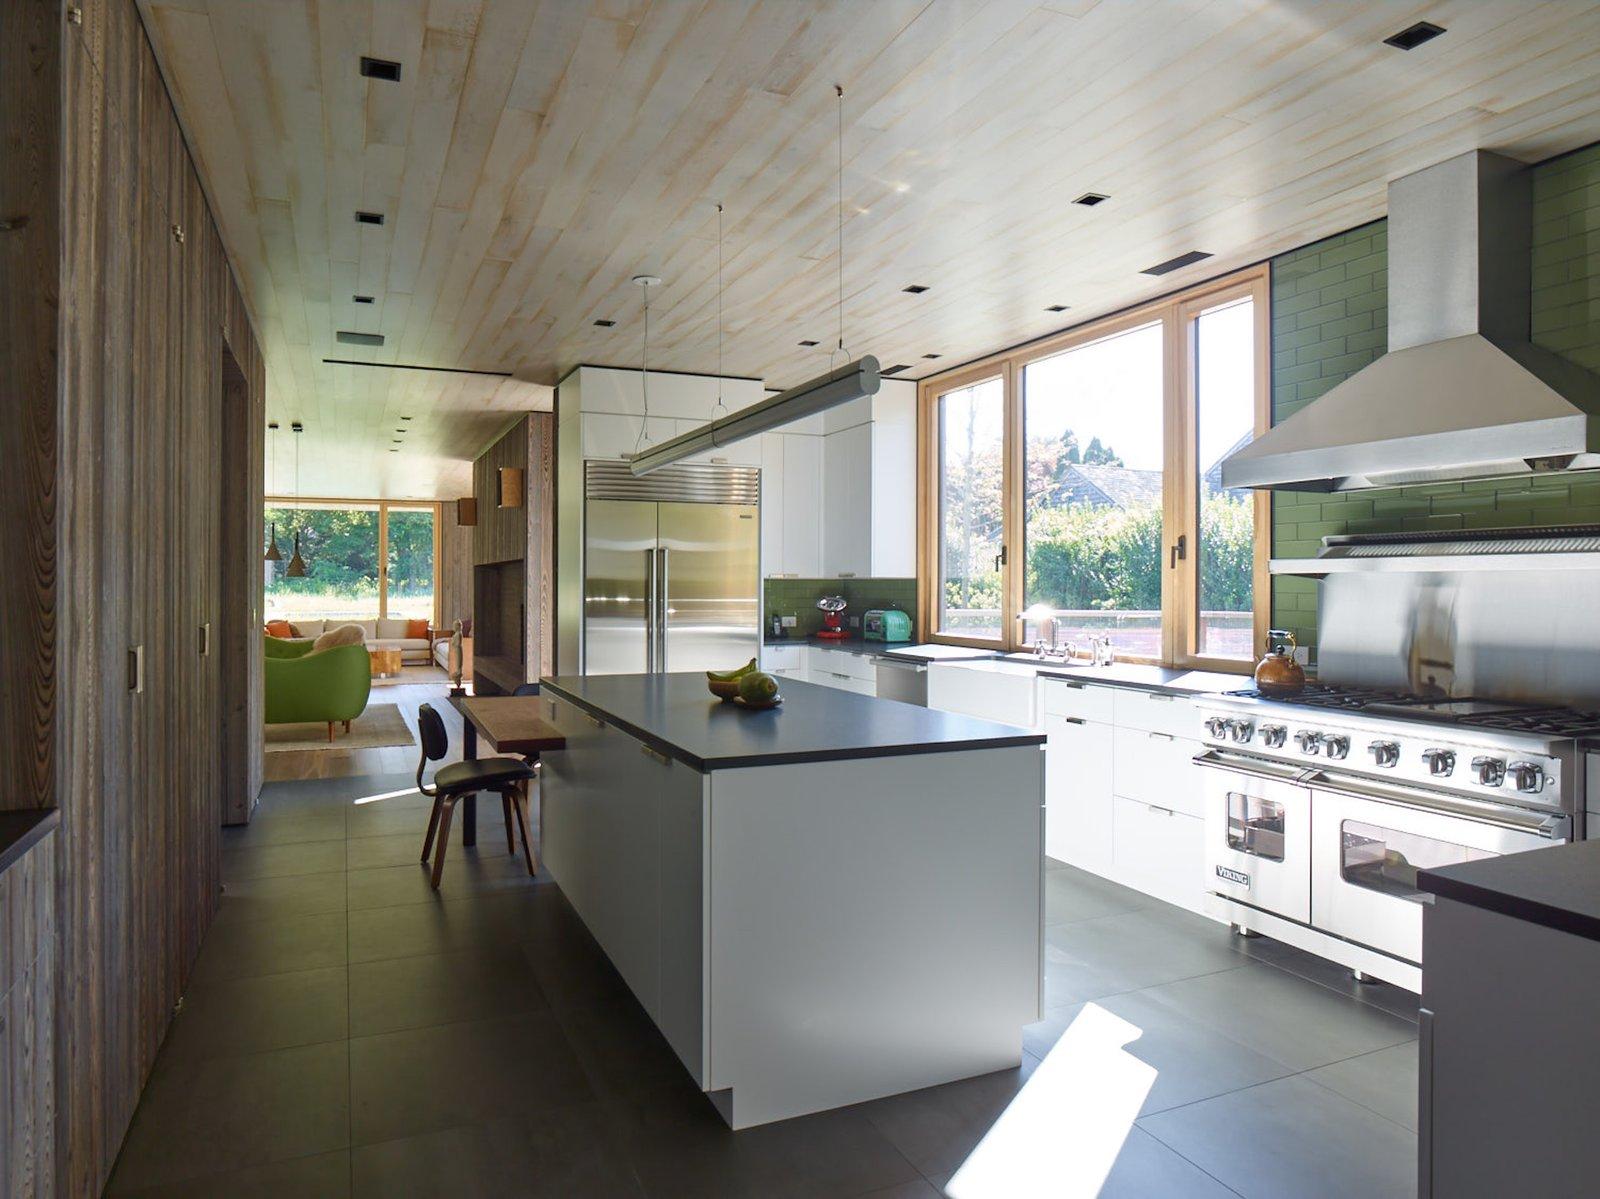 A bright and elegant kitchen.